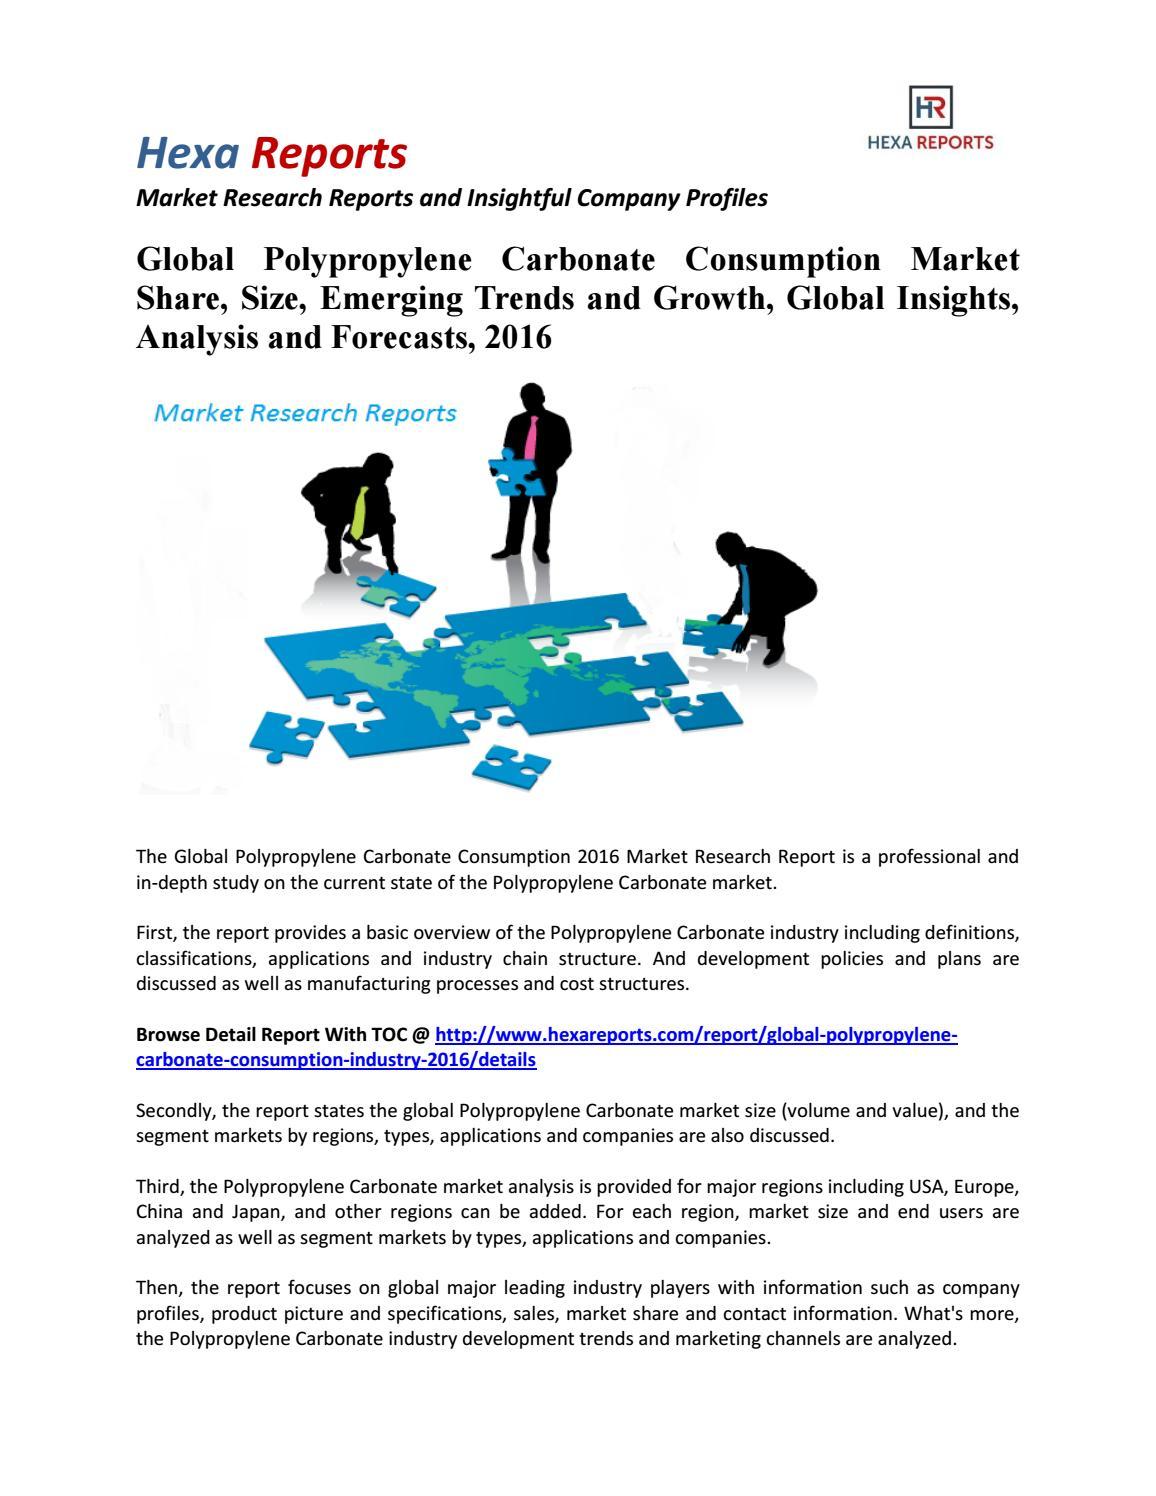 Global polypropylene carbonate consumption market share